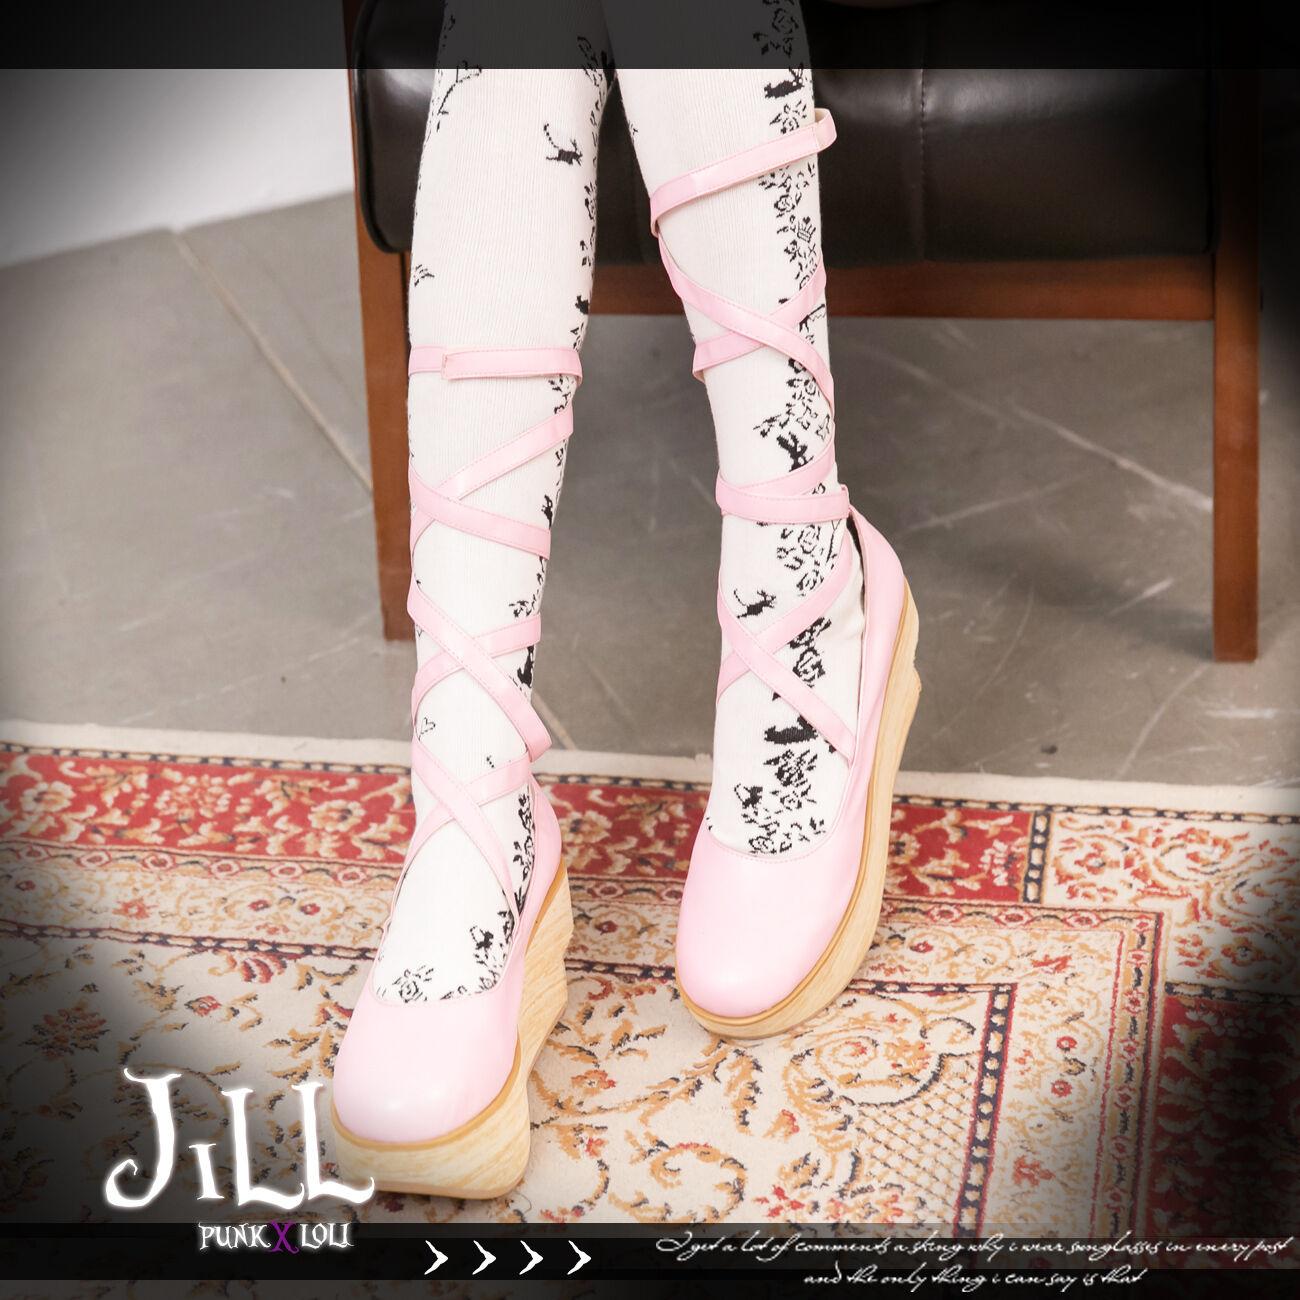 sconto di vendita Lolita Kera NANA Ballerina Doll Strappy strap platform platform platform heel scarpe JAN9954  popolare